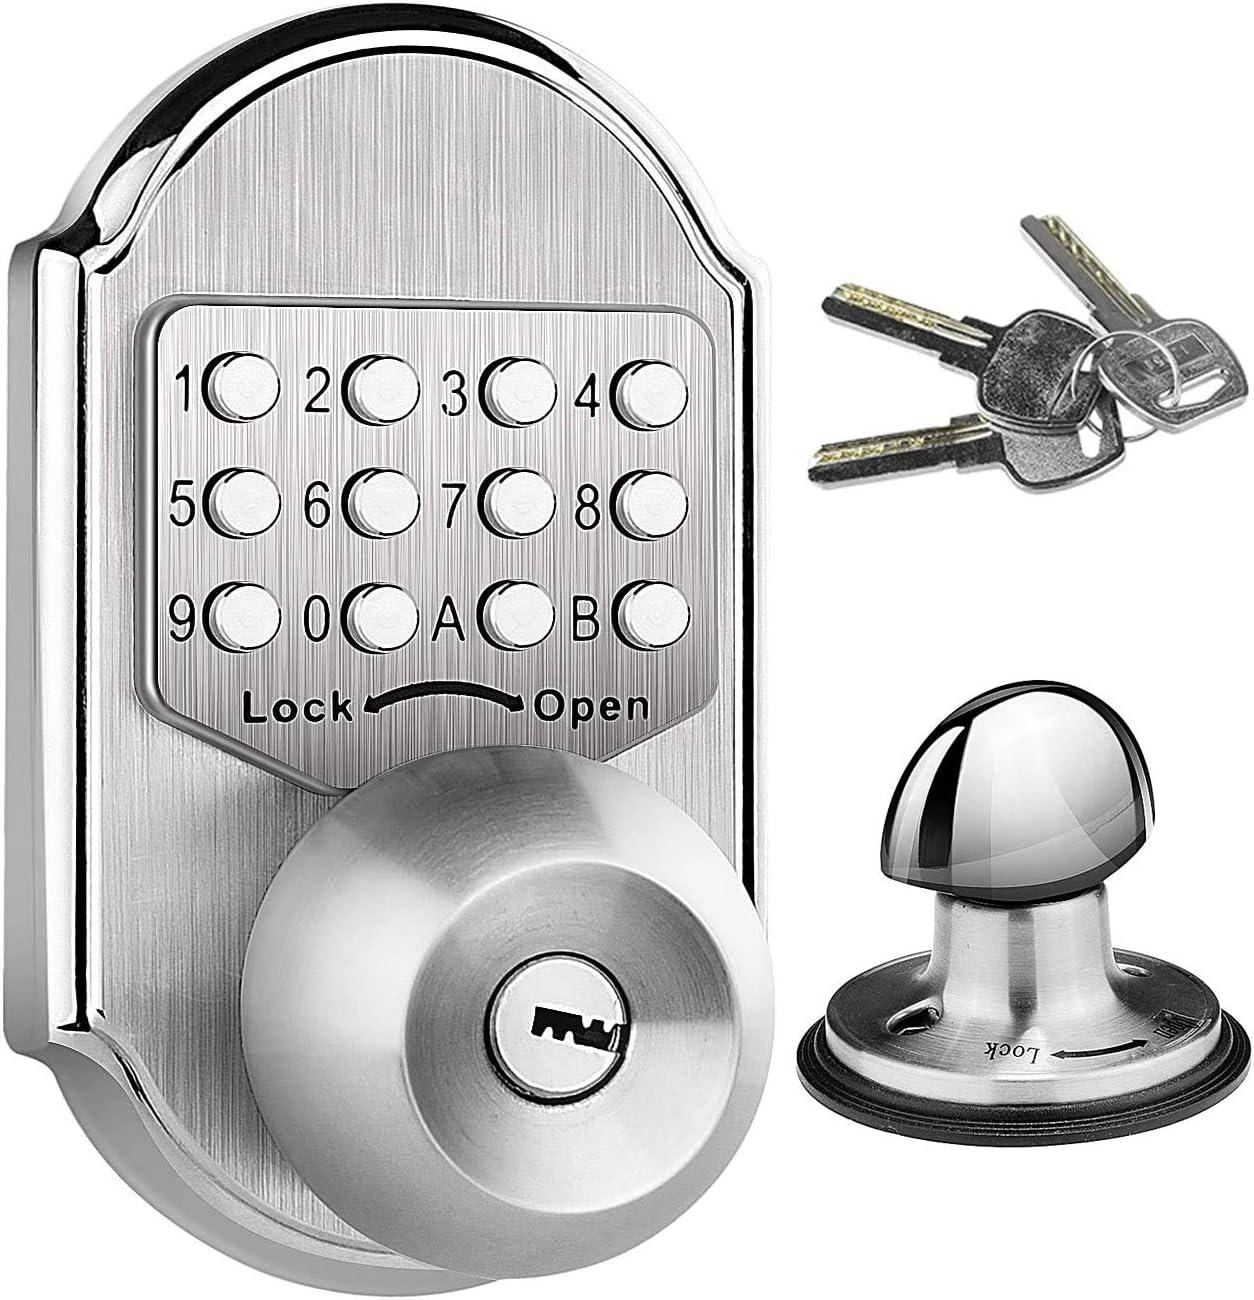 Stainless Steel Digital Keypad Code Wifi Smart Deadbolt Door Home Security Locks